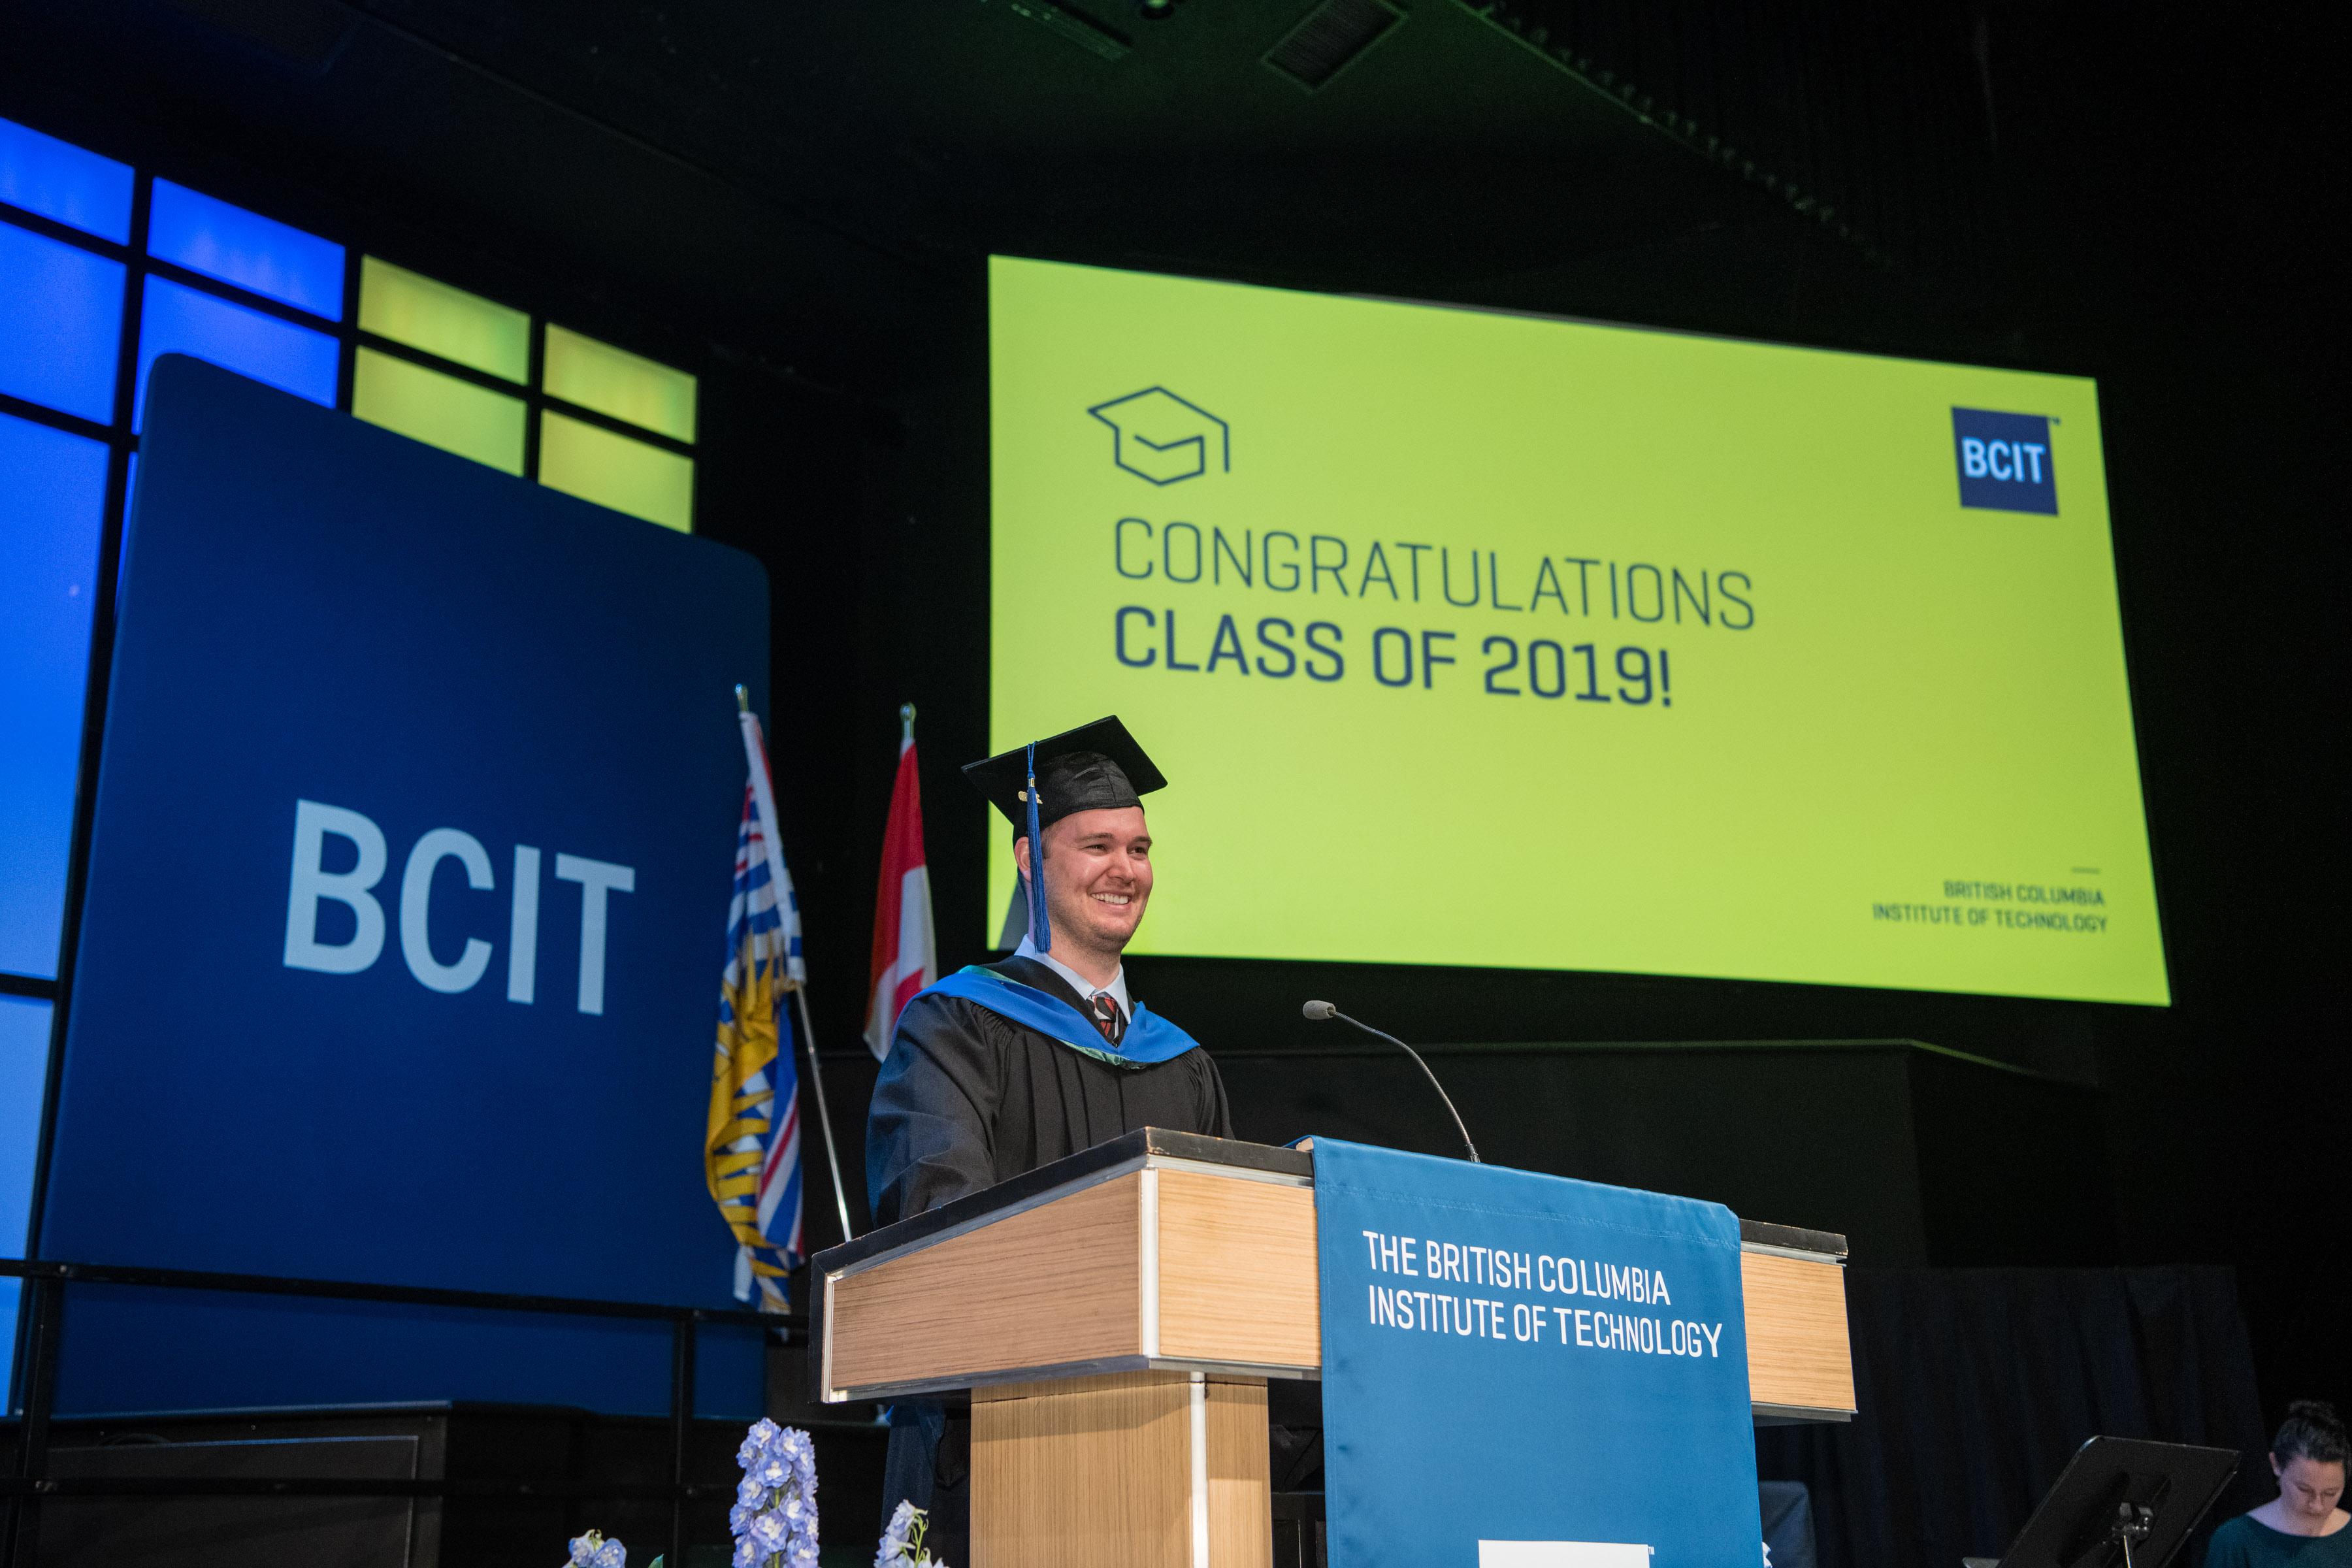 BCIT Valedictorian Nic Johnson